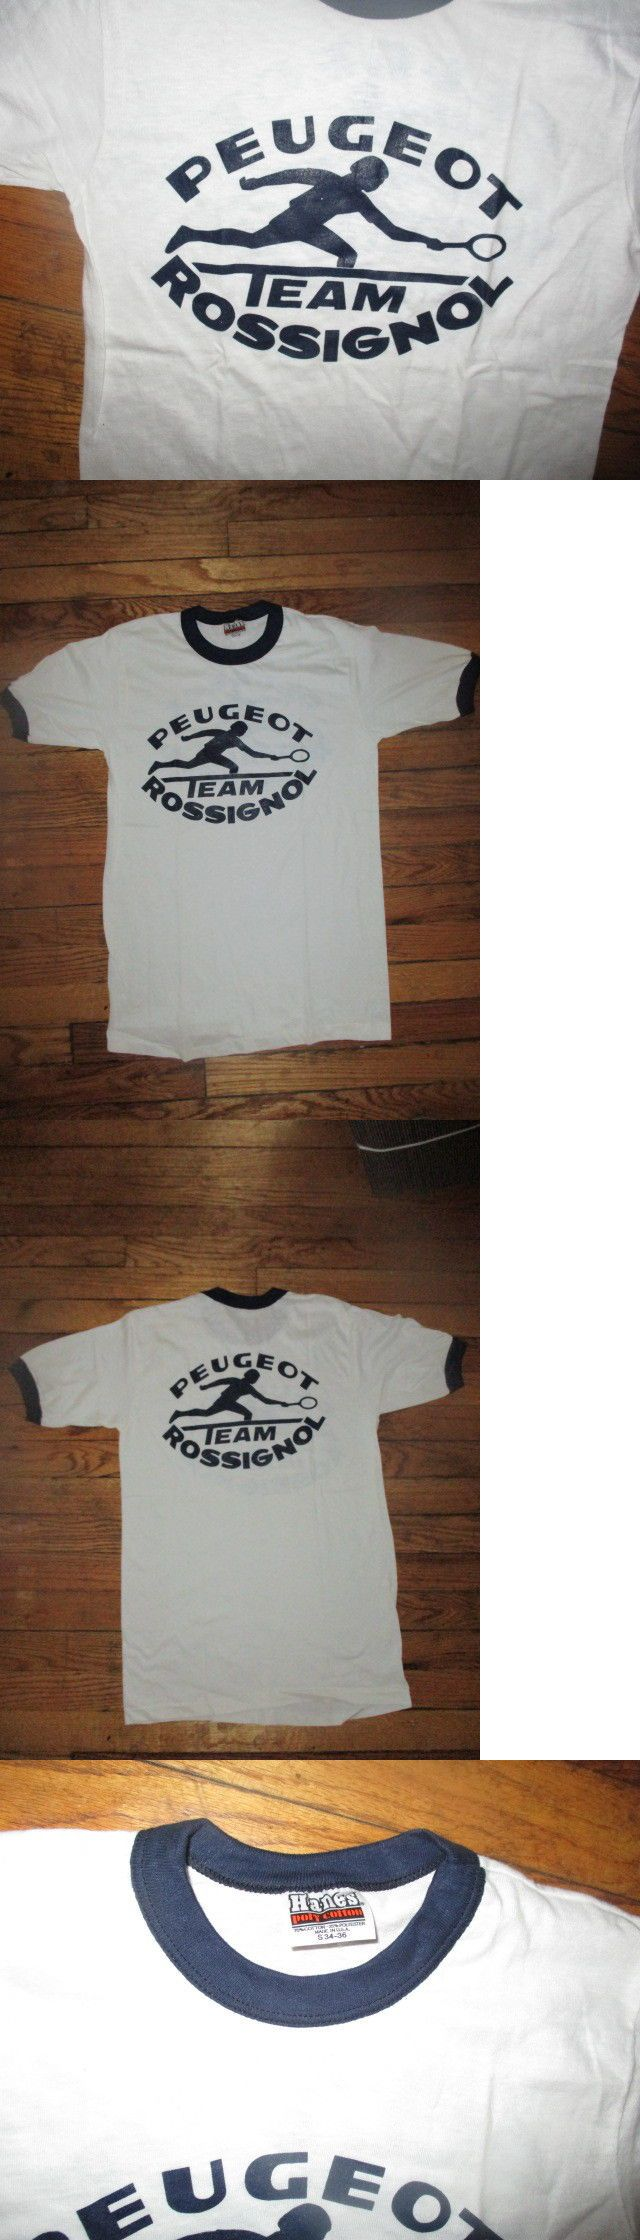 Tennis 430: Vintage 80 S Peugot Team Rossignol Logo Shirt Sm Mats Wilander Johan Kriek Nwot -> BUY IT NOW ONLY: $59.99 on eBay!